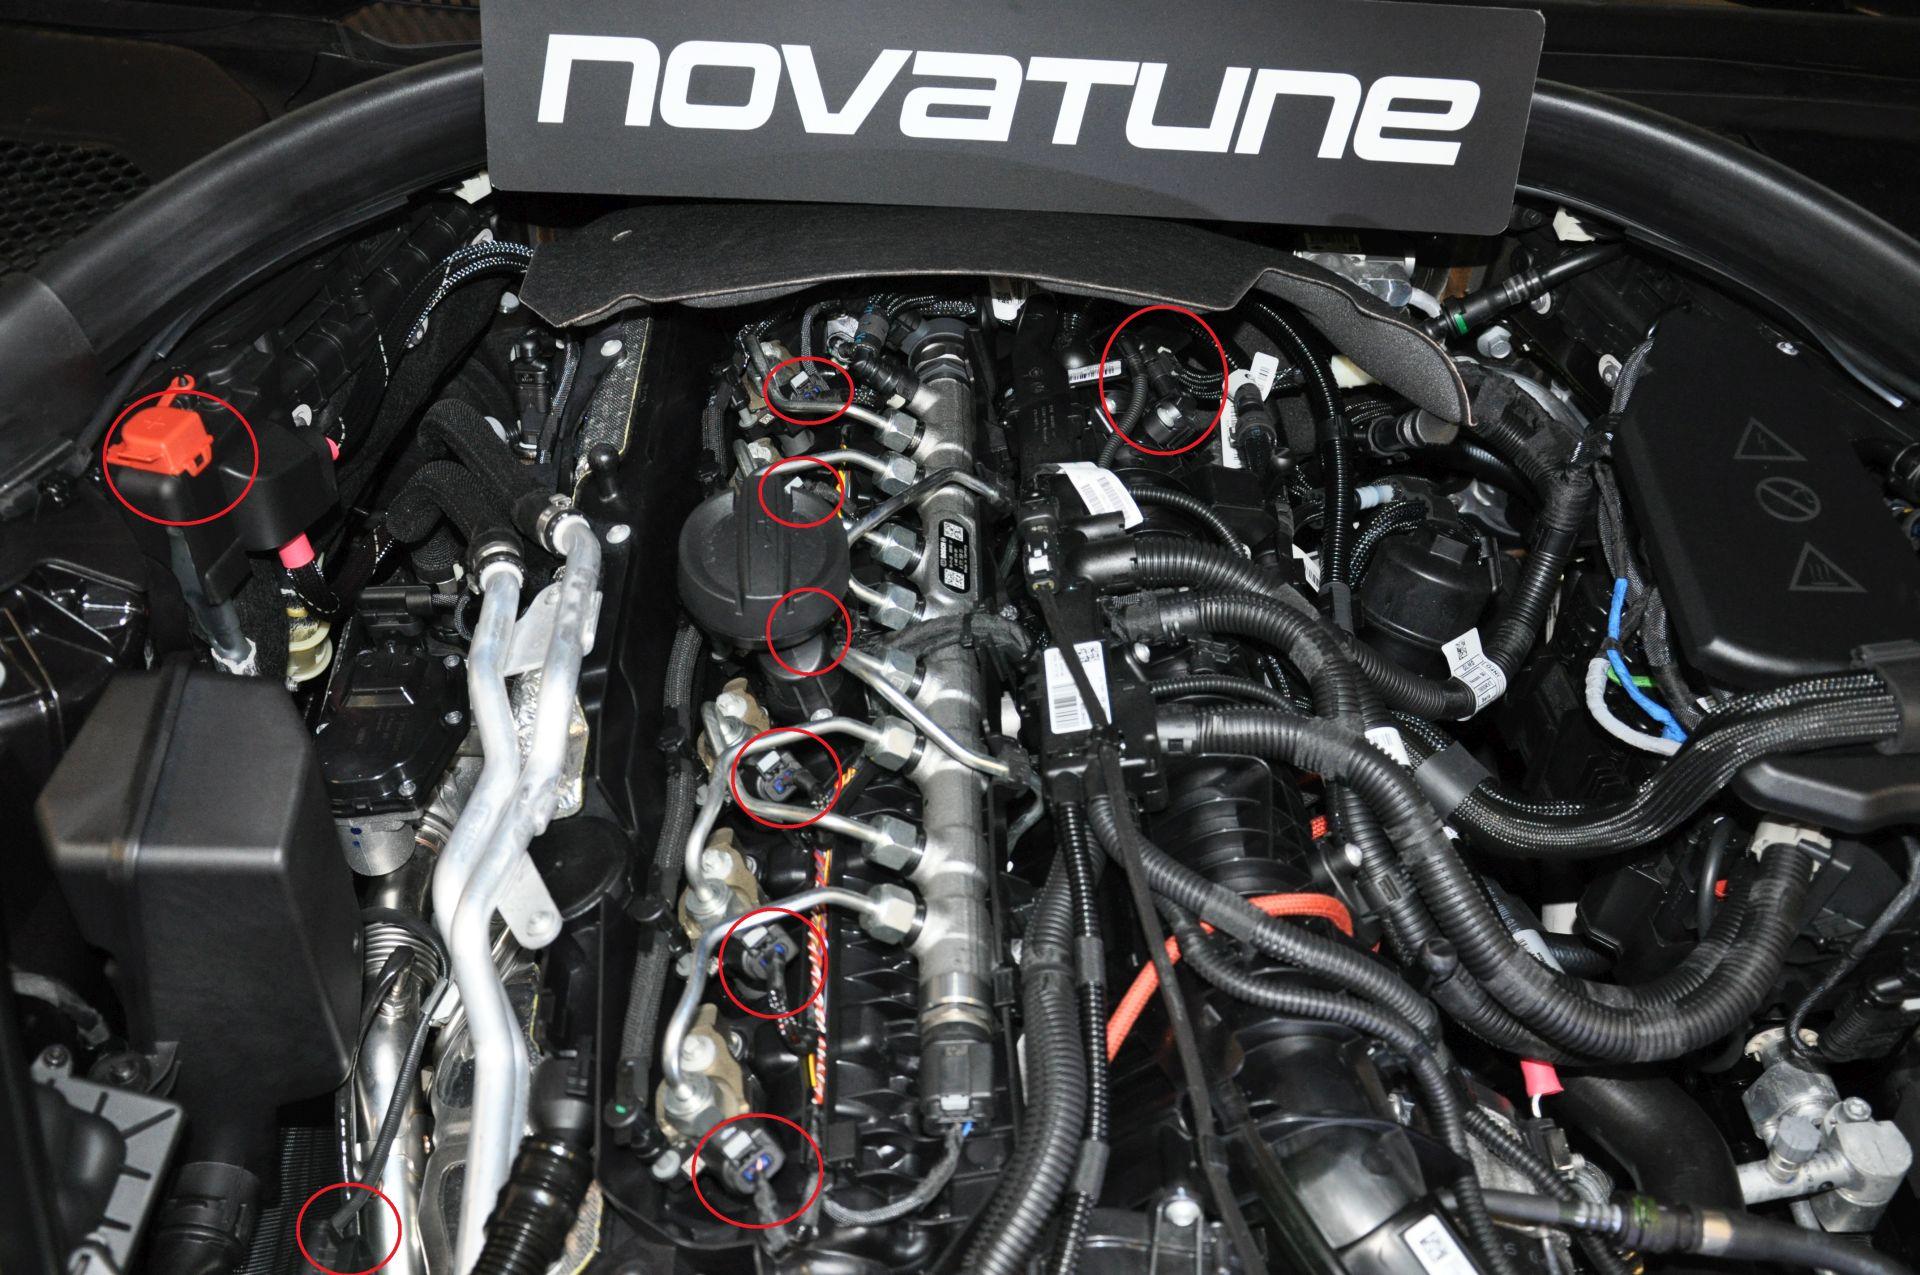 Увеличение мощности в двигатели своими руками